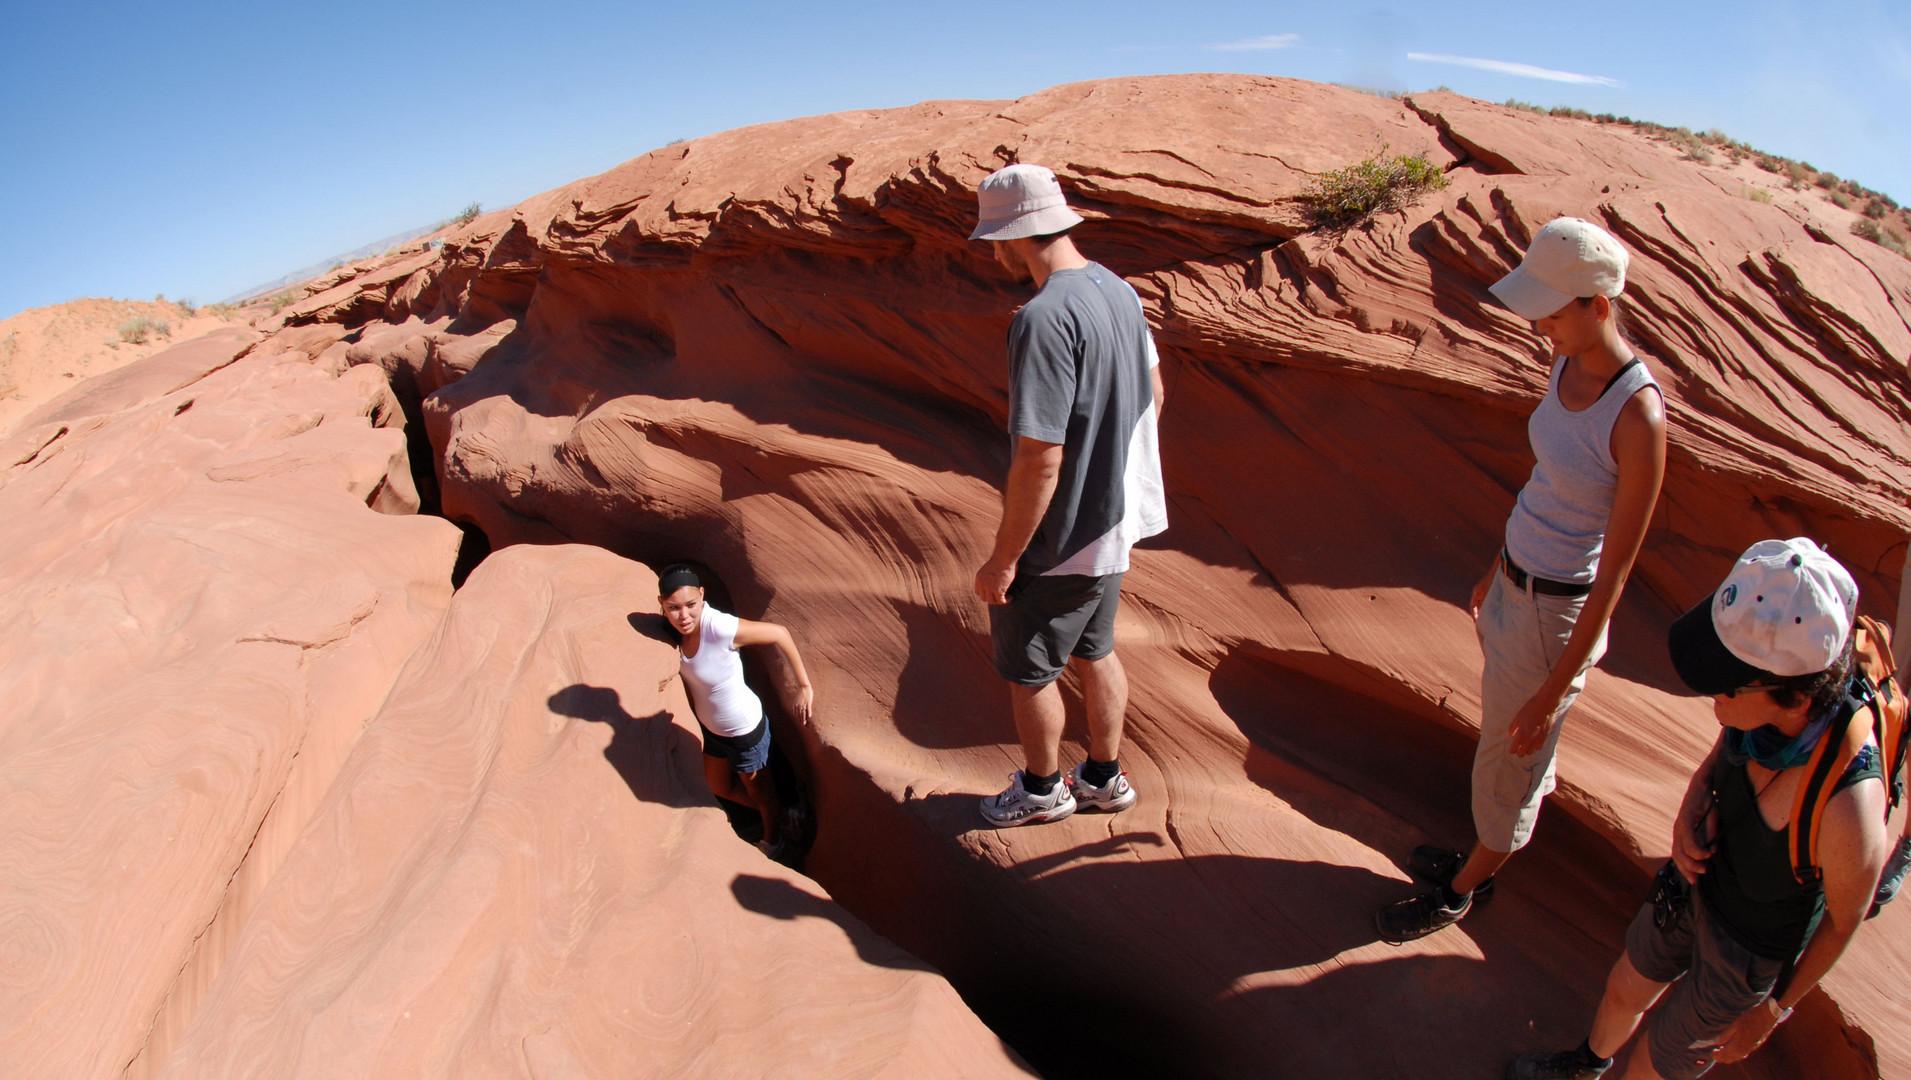 Einstieg Lower Antelope Canyon